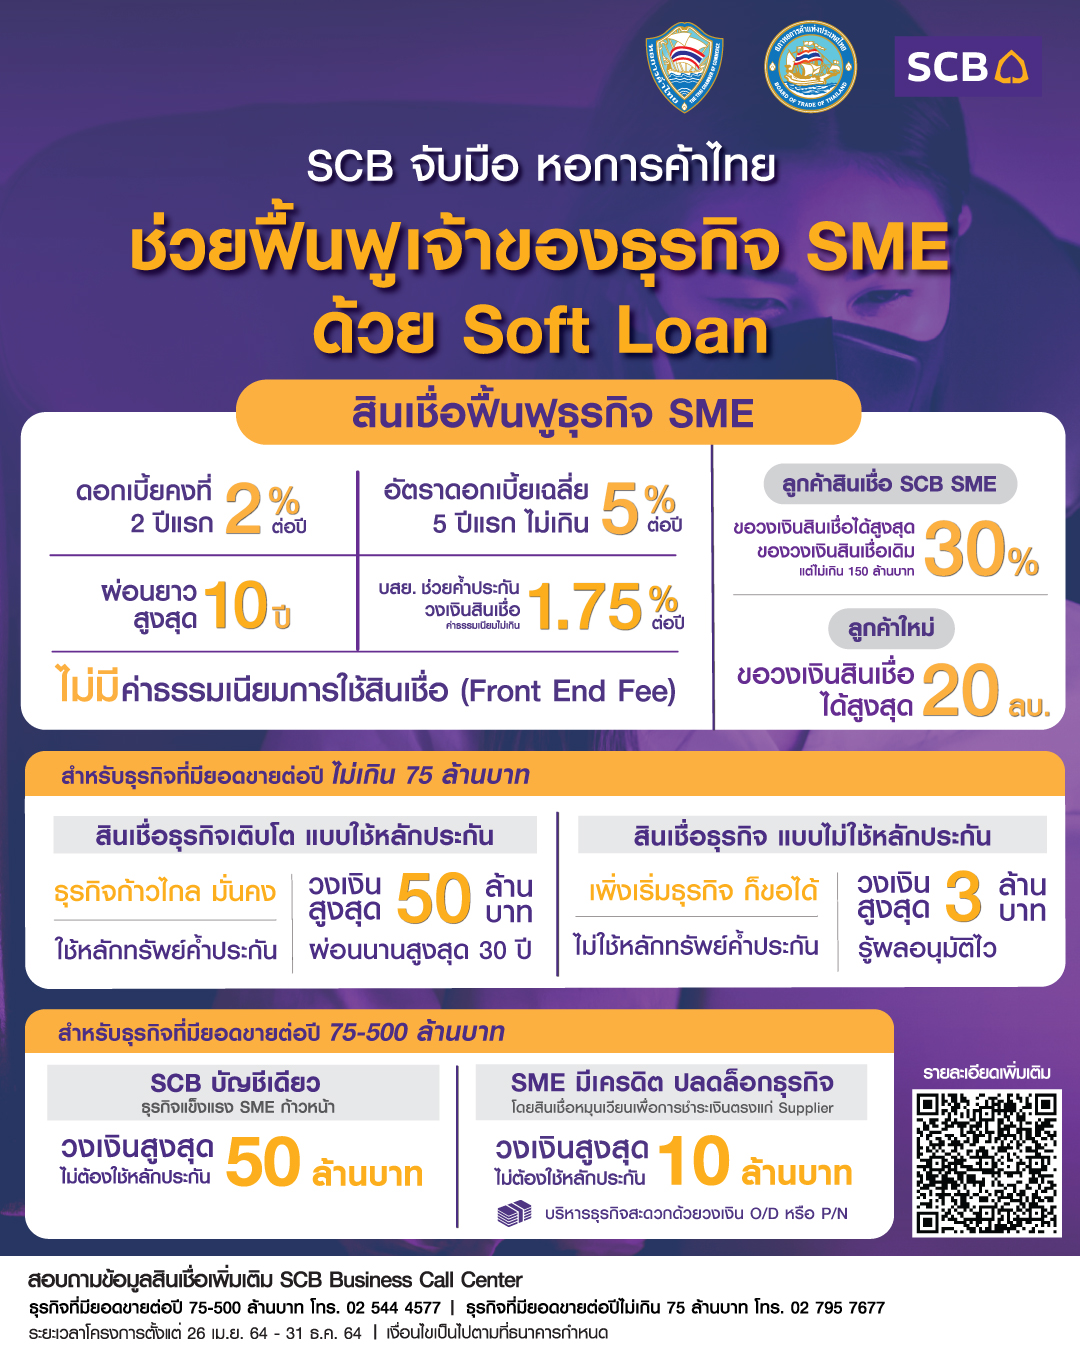 SCB จับมือ หออการค้าไทย ช่วยฟื้นฟูเจ้าของธุรกิจ SME ด้วย Soft Loan